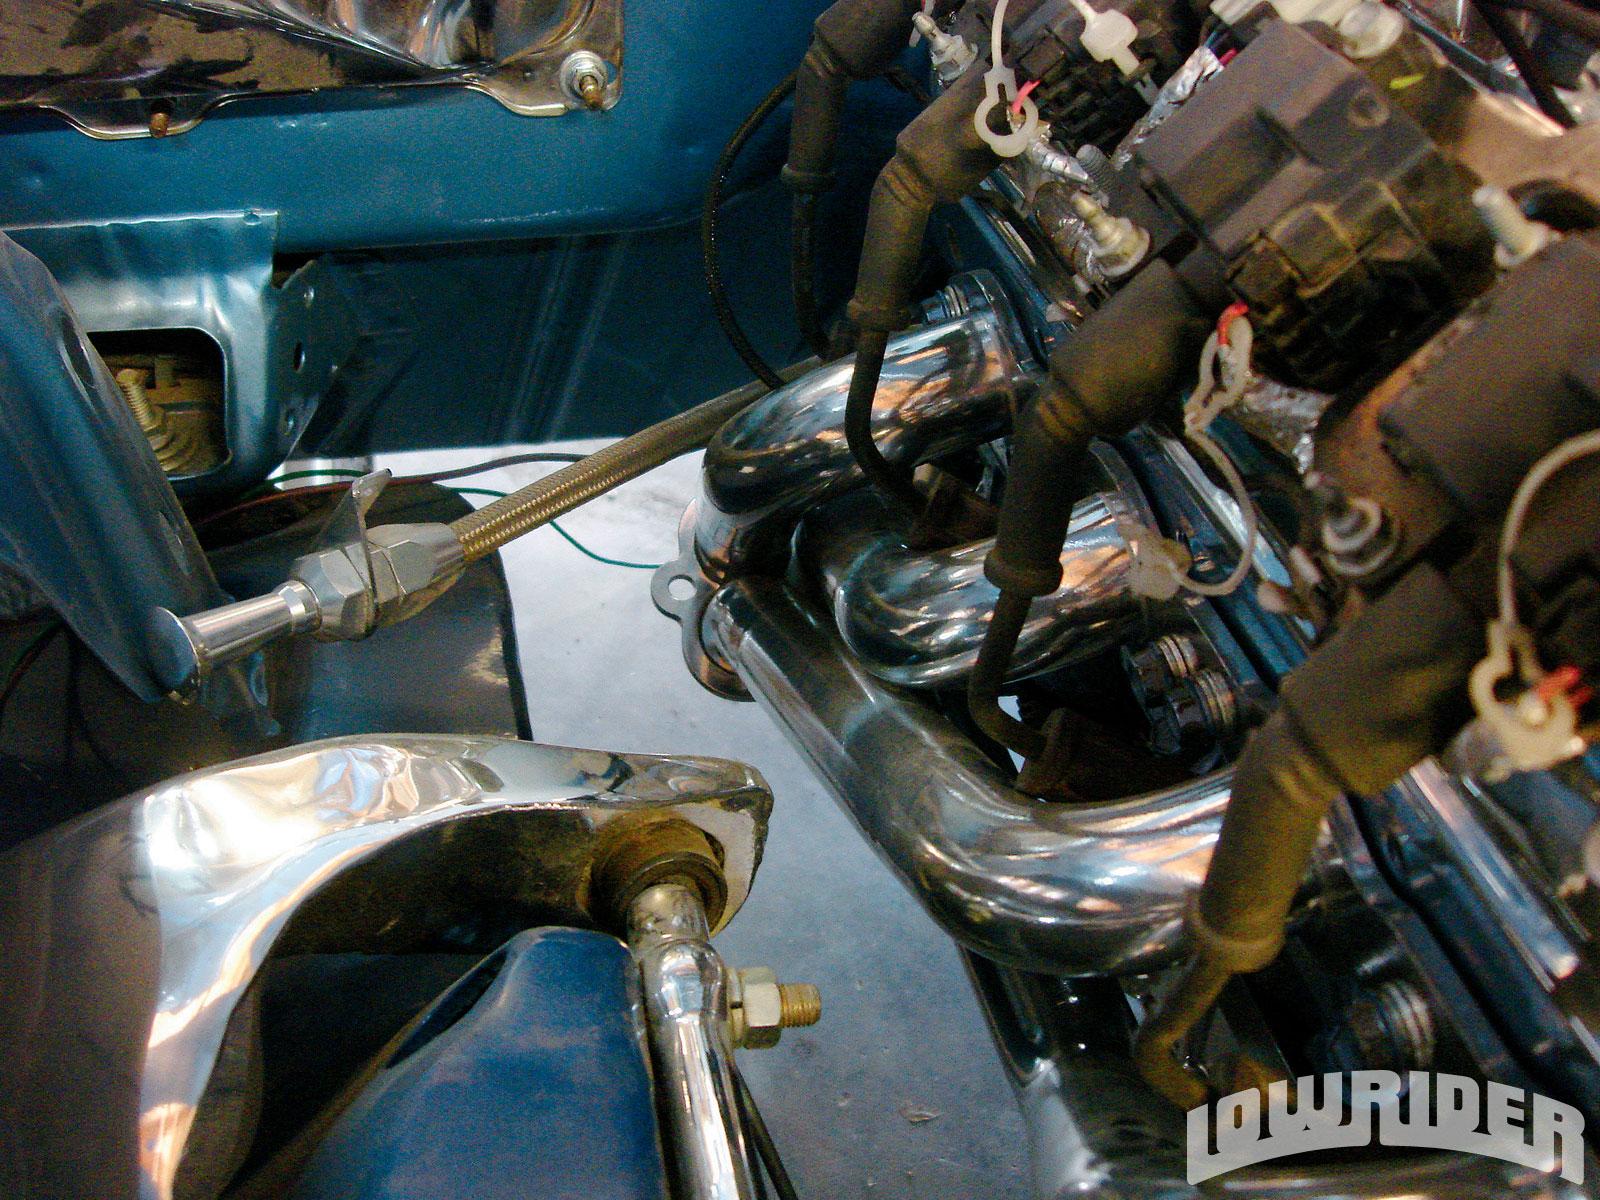 General Motors Ls Series Engine Build Ultimate Hydraulics 2001 Impala Fuel Filter 26 31